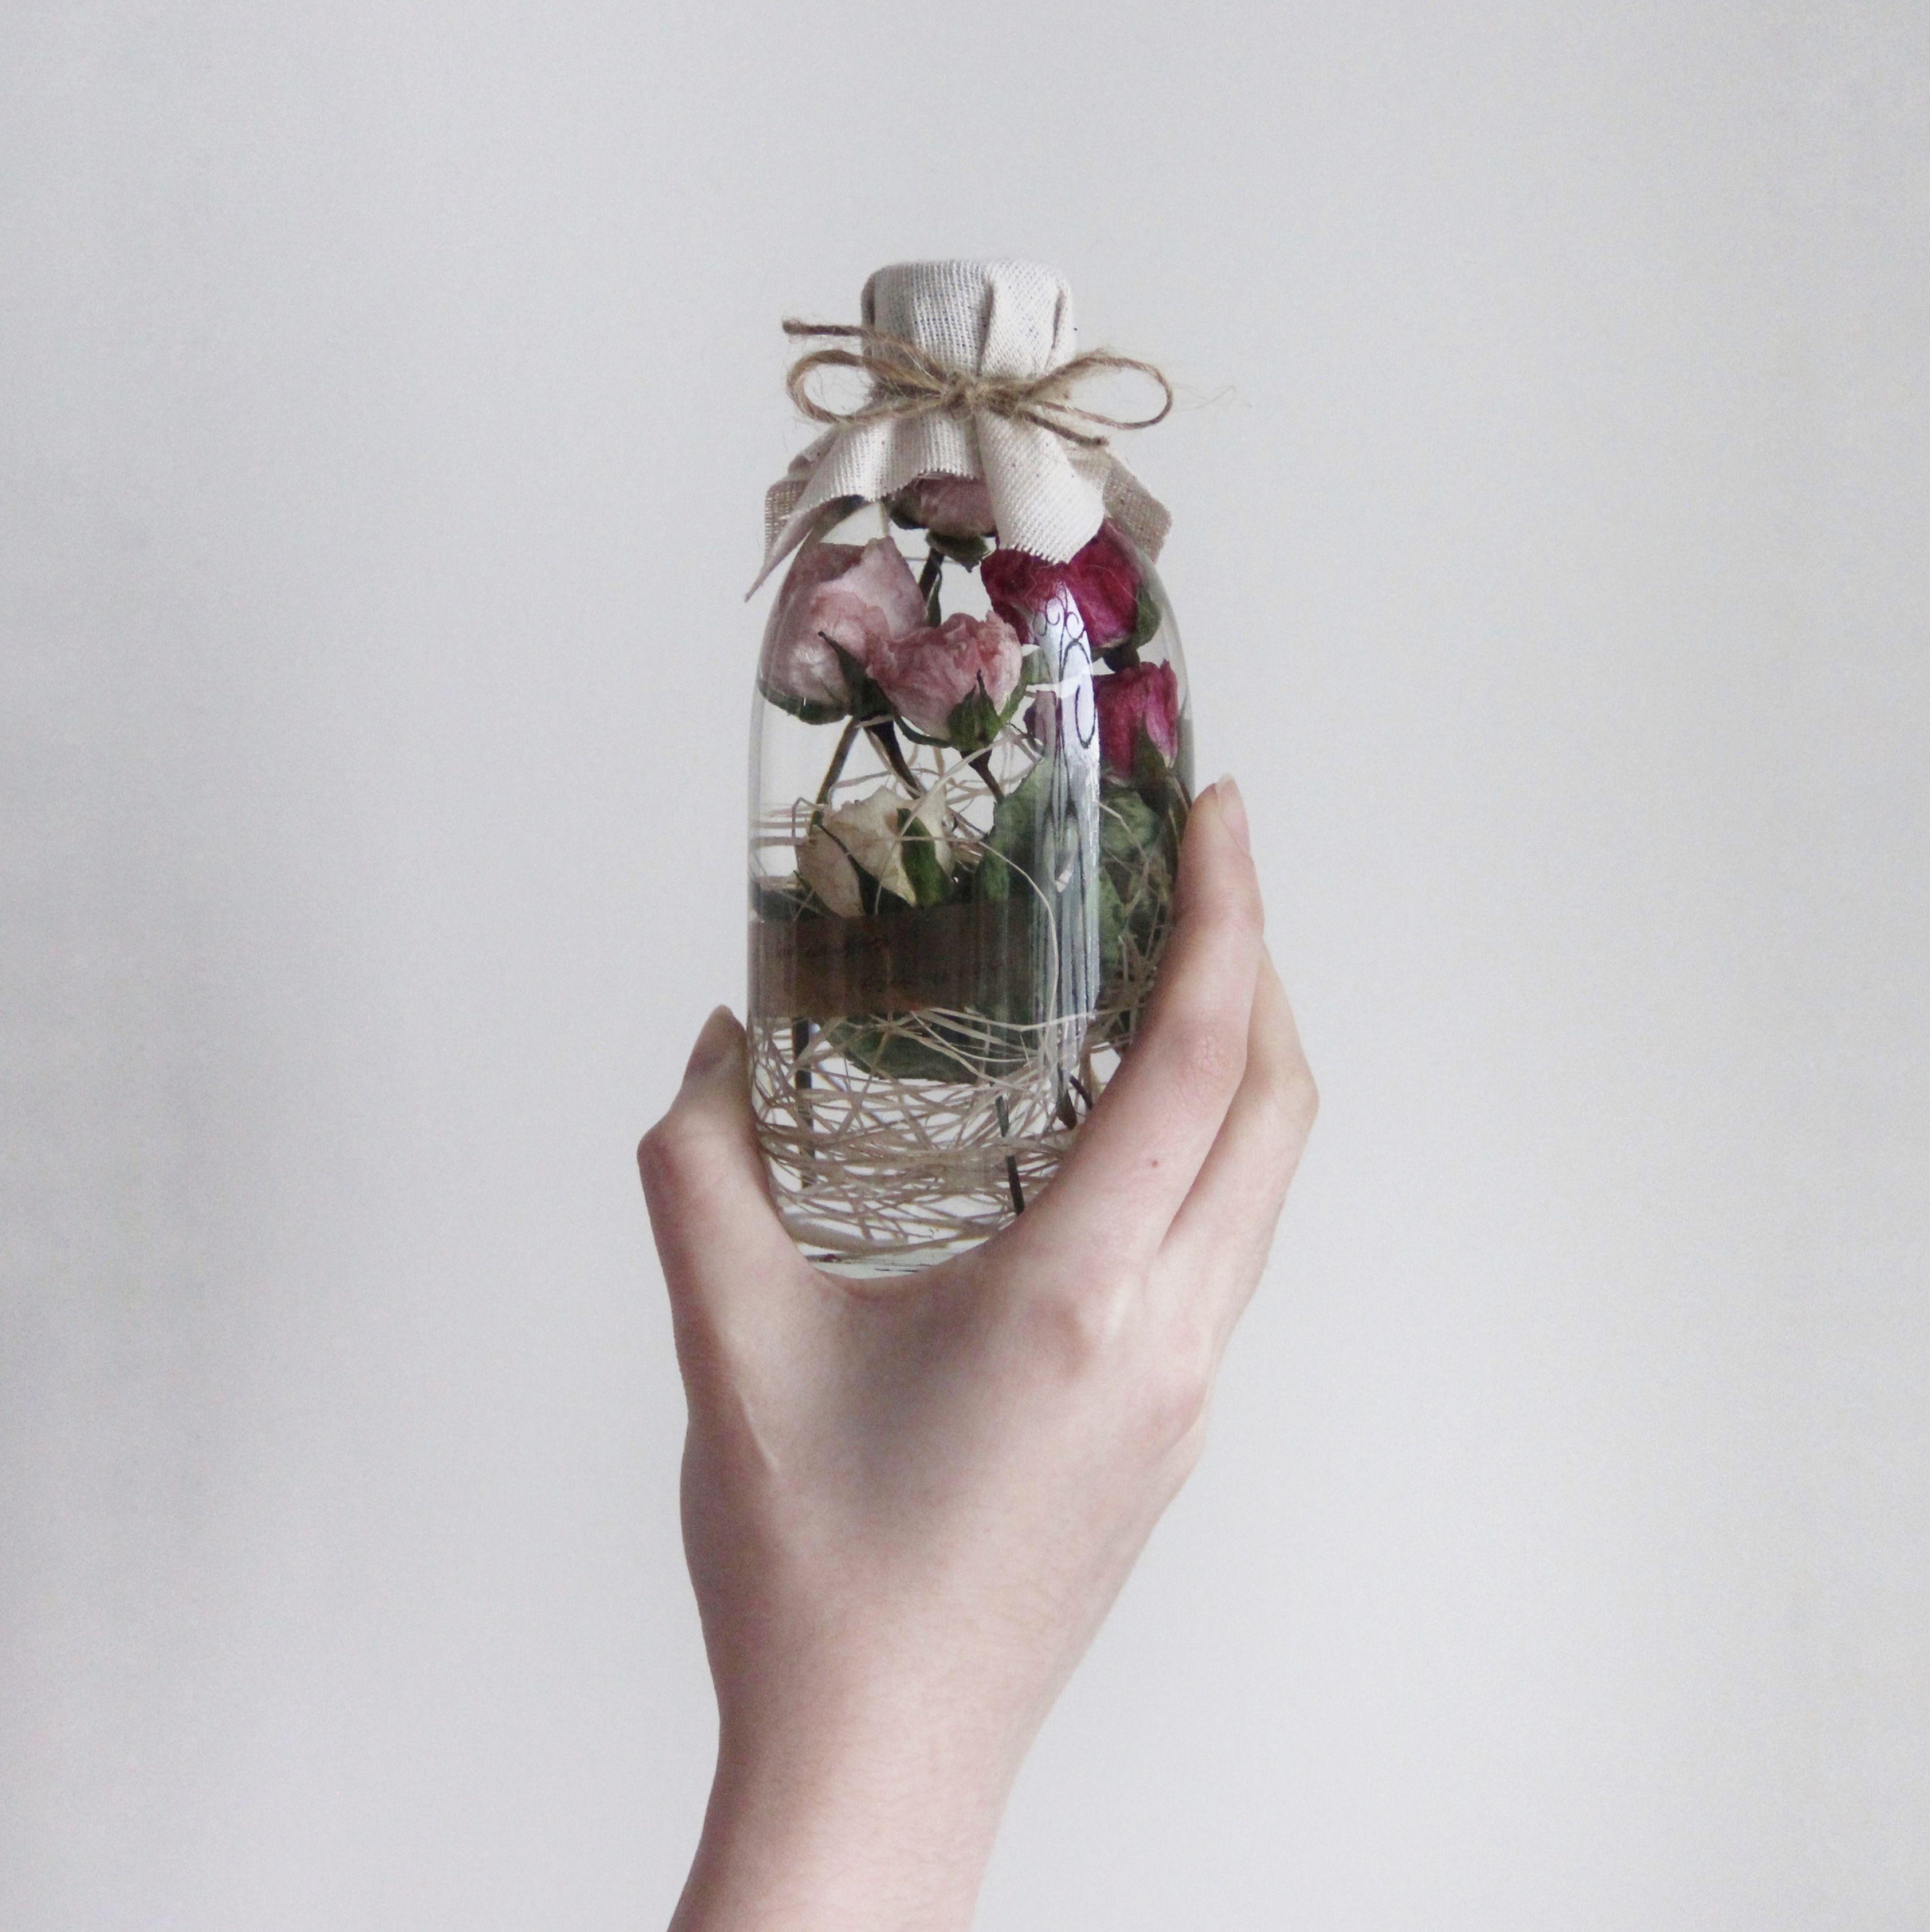 Pin Oleh Aliceblue Florist Di Dried Flowers Bunga Kering Bunga